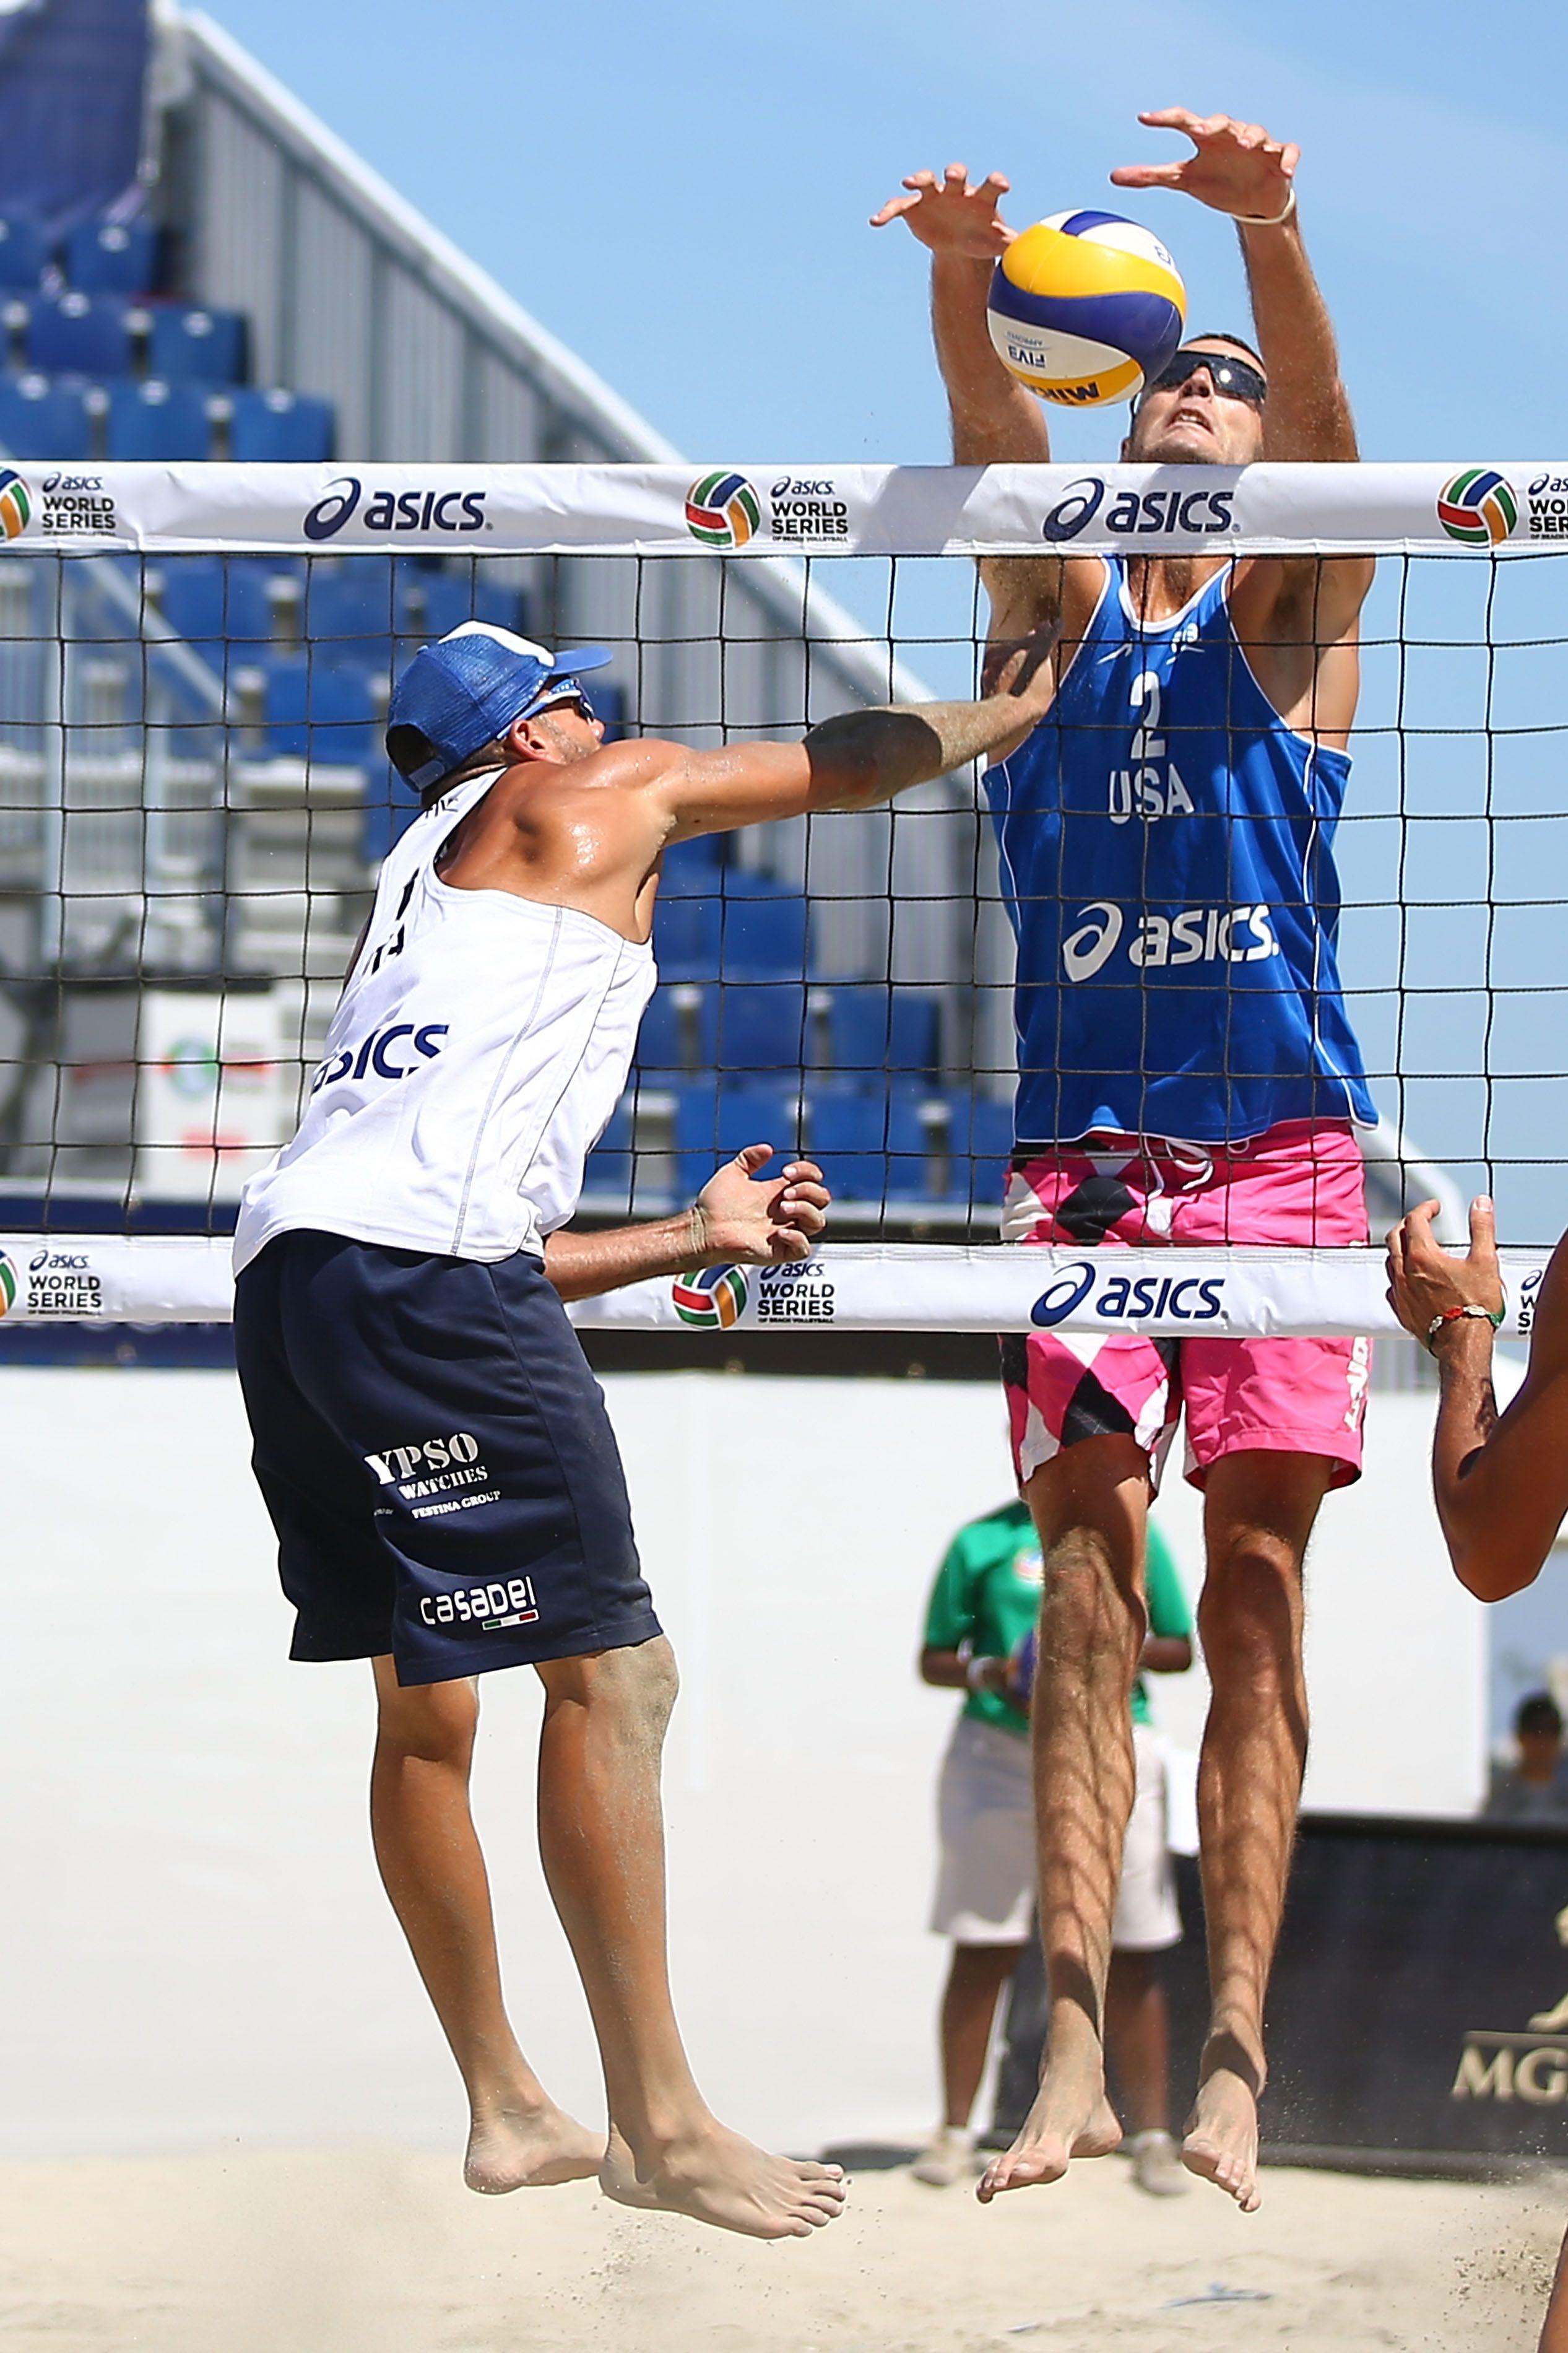 Ryan Doherty 7 1 Beach Volleyball Player Beach Volleyball Volleyball Players All Volleyball